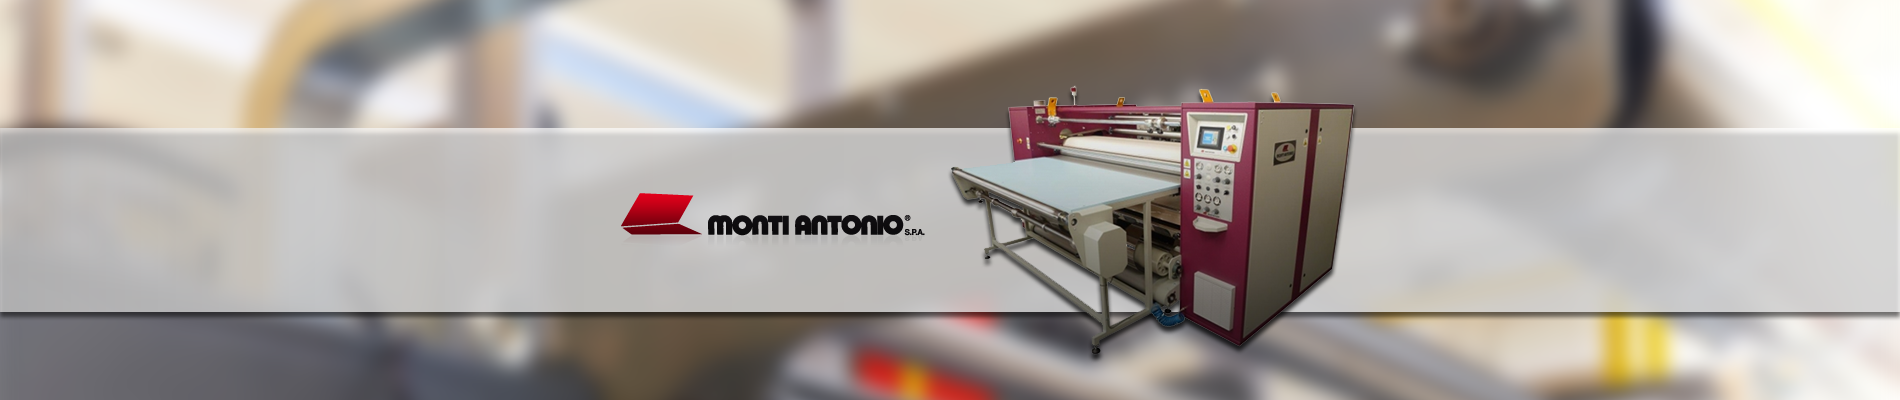 monti-antonio-banner